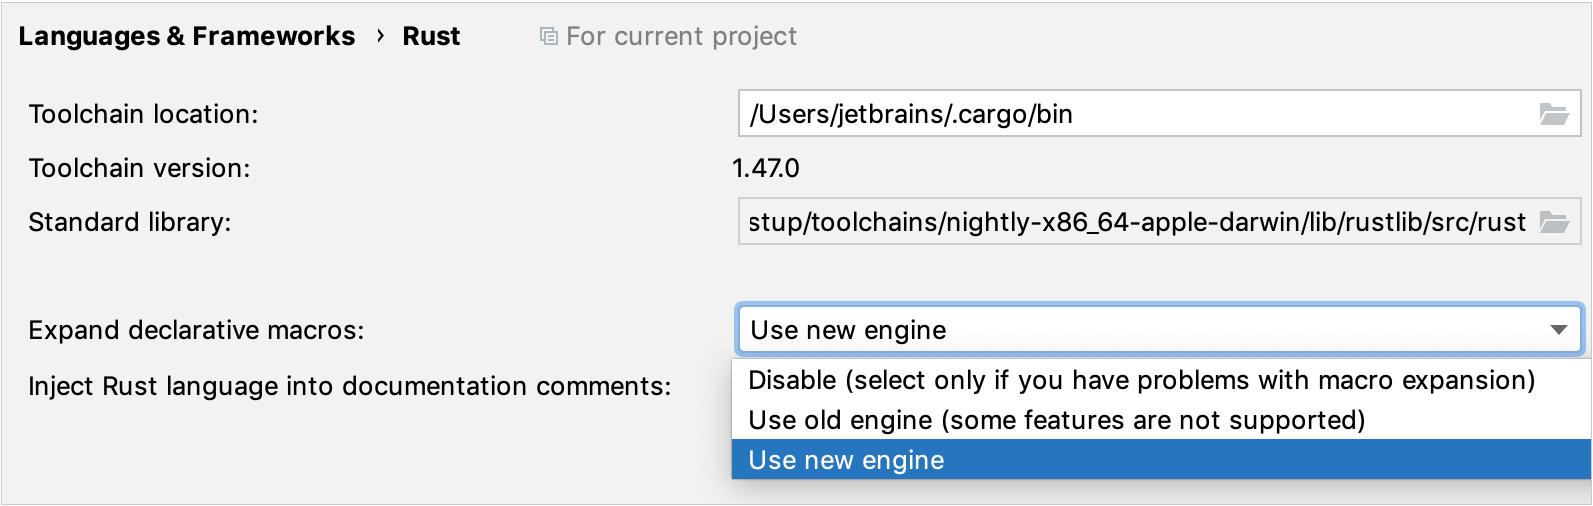 General Rust project settings